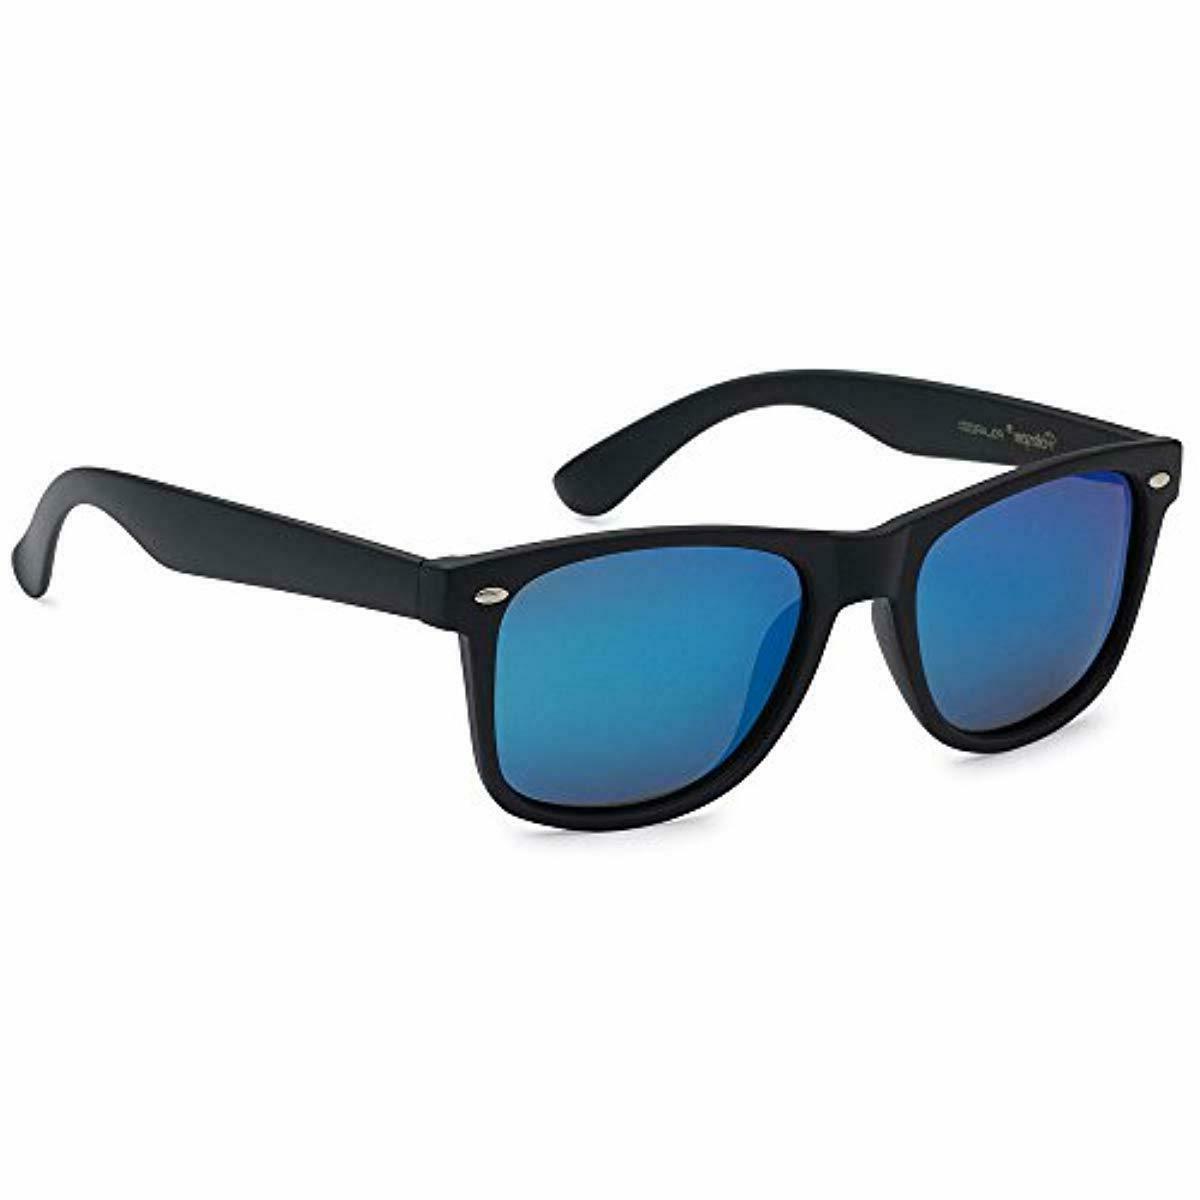 Retro Classic Trendy Sunglasses Polarized for